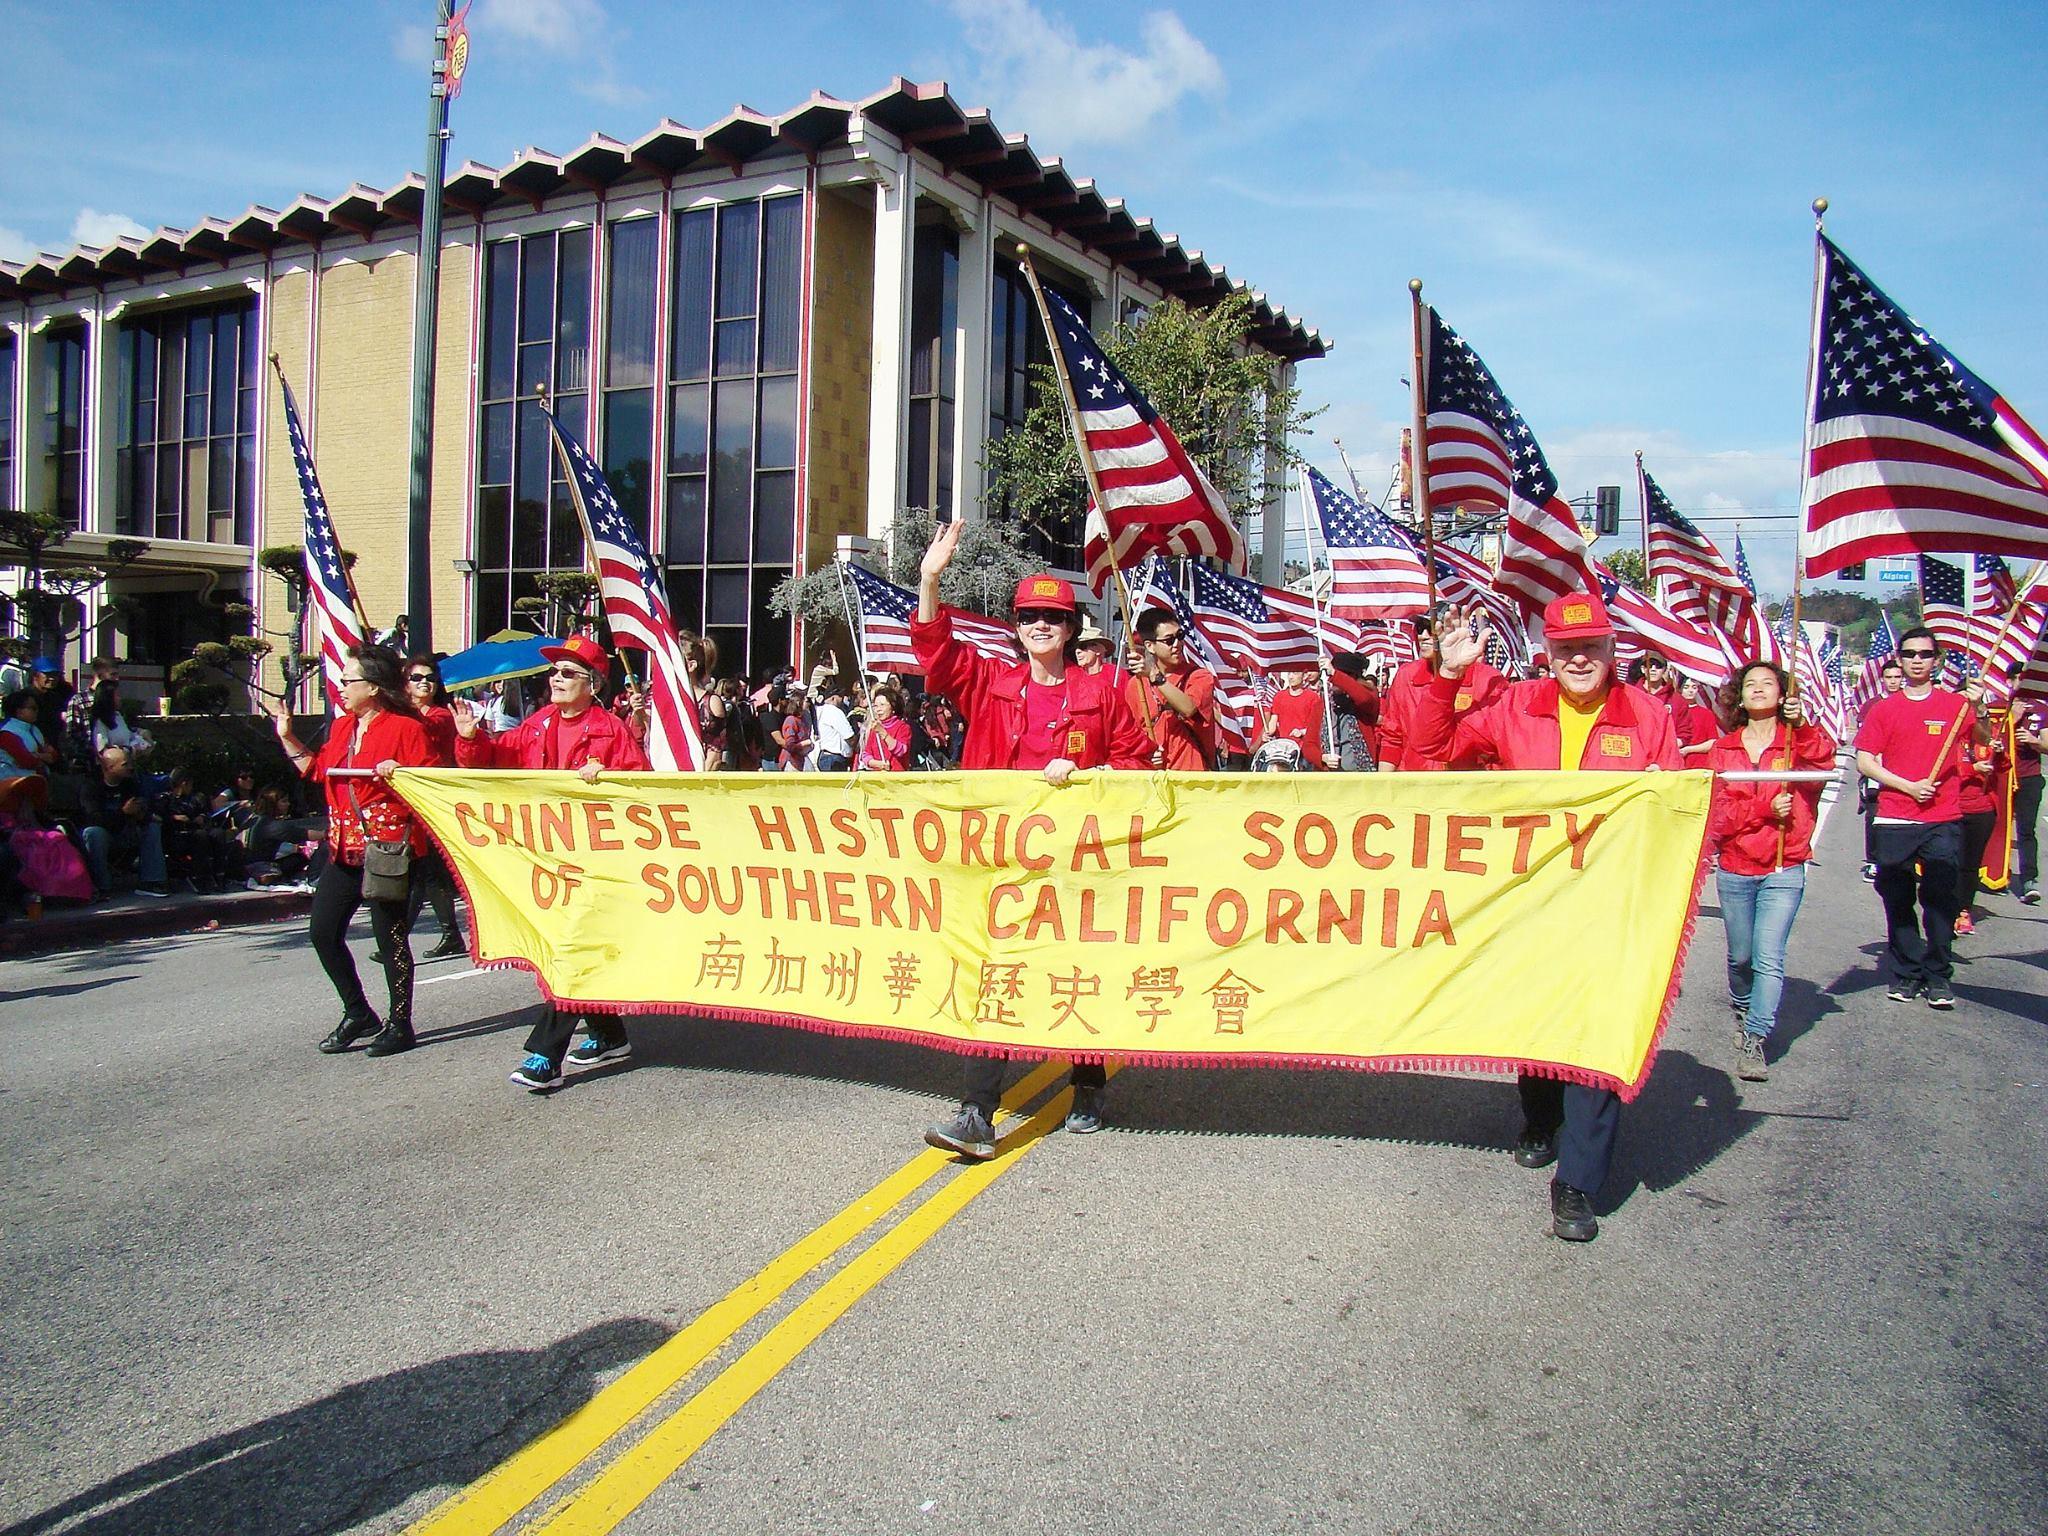 Chinese Historical Society of Southern California.jpg